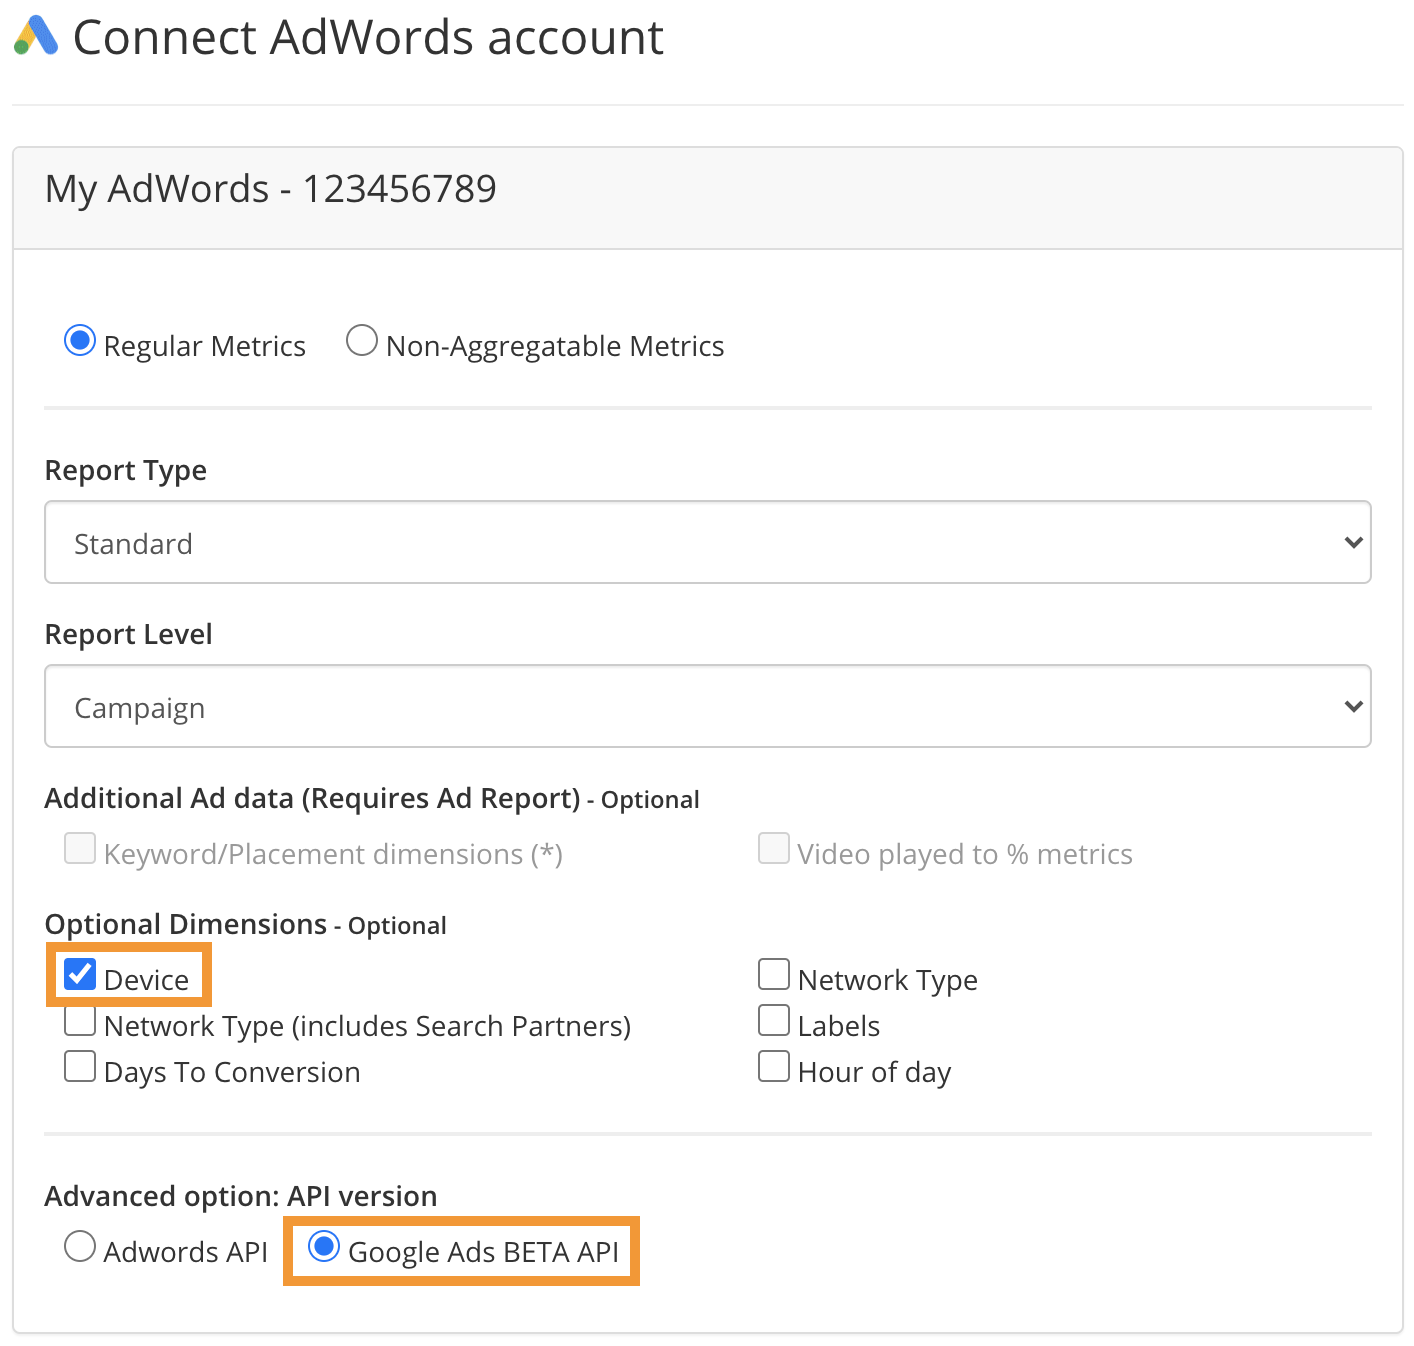 adwords-connect-Jun-30-2020-11-22-40-66-AM